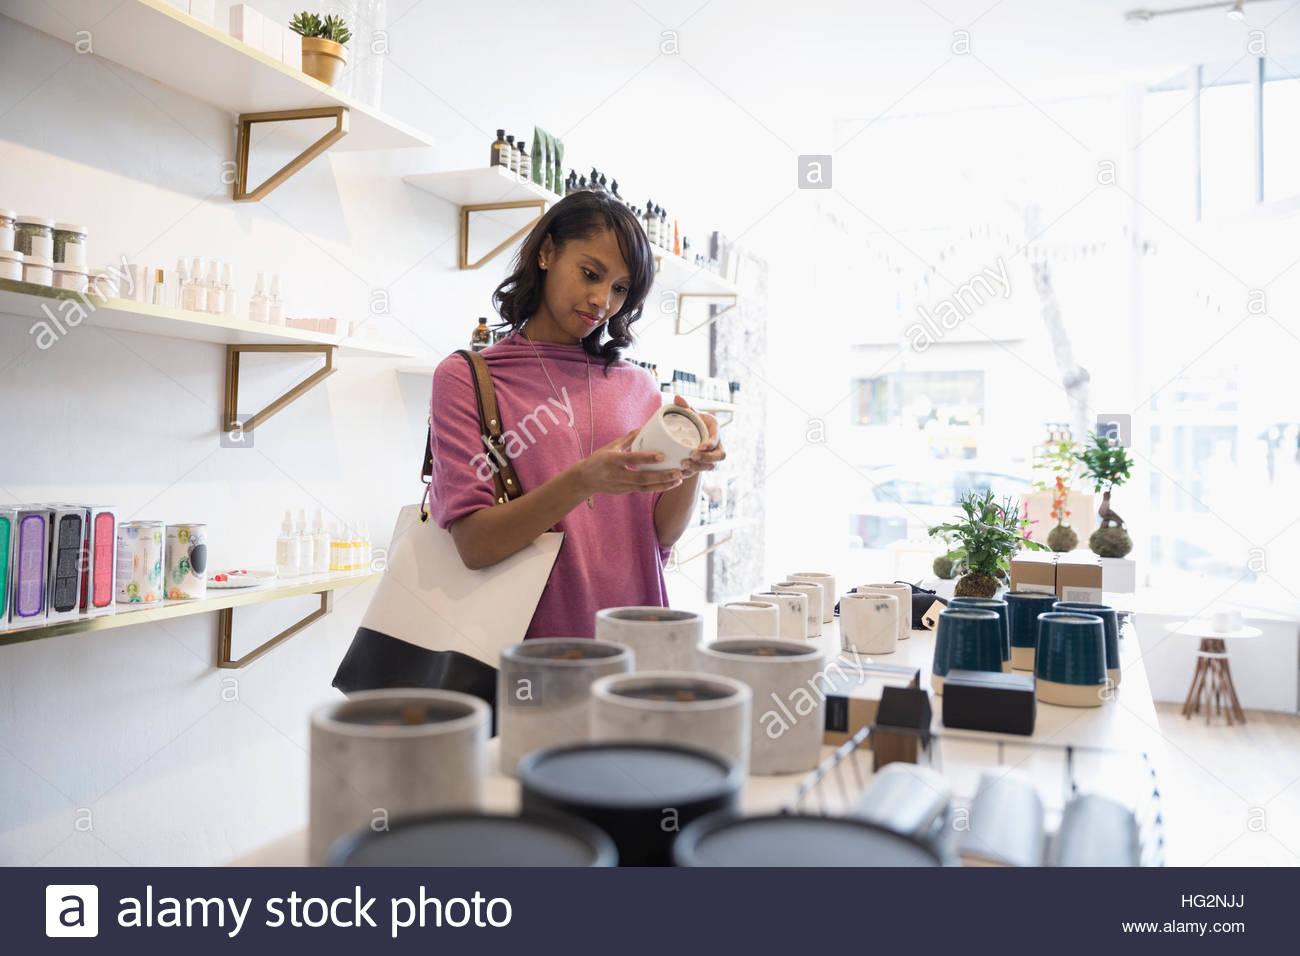 Shopping femme bougies navigation accueil boutique parfums Photo Stock